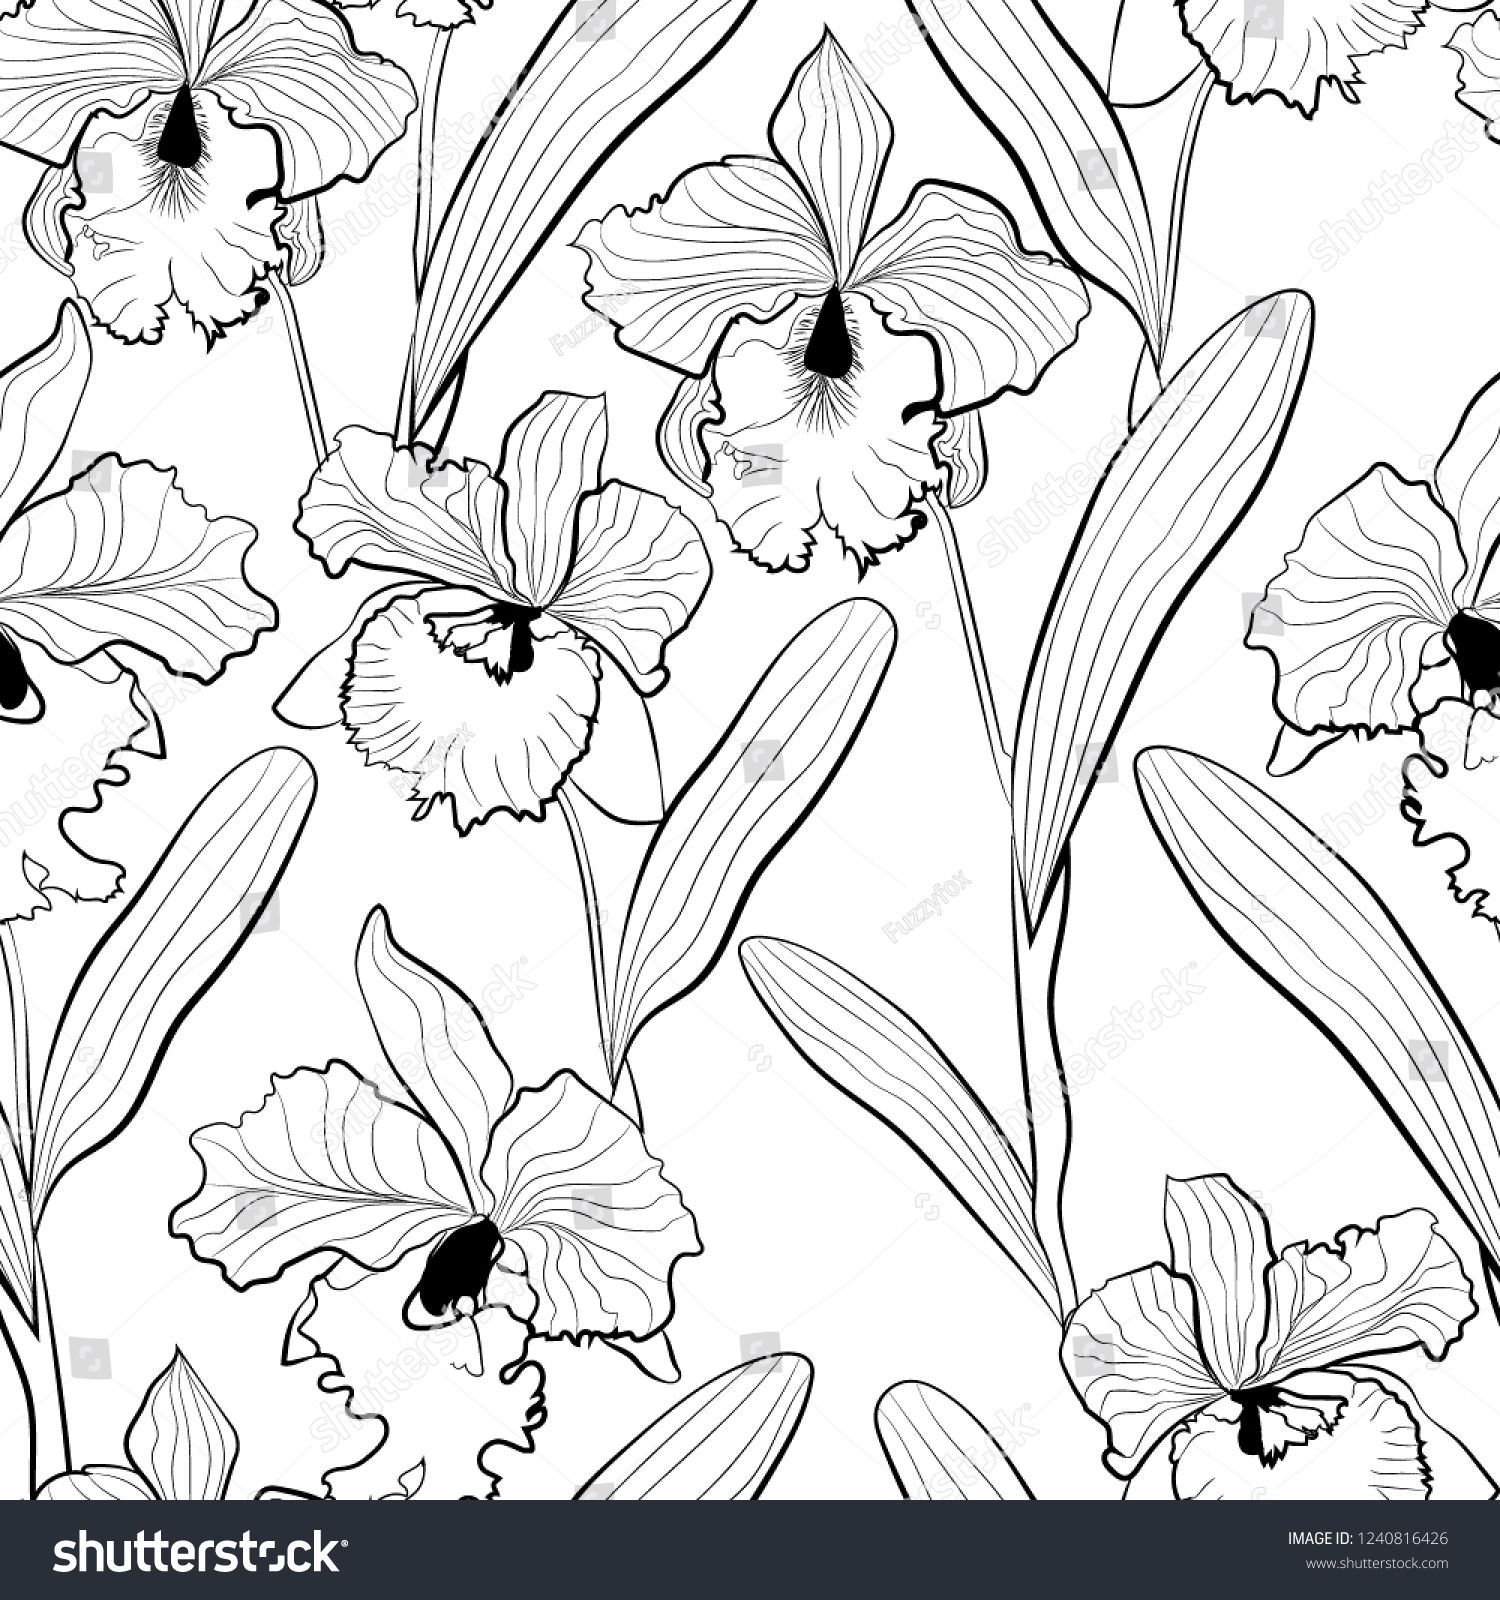 Vector De Stock Libre De Regalias Sobre Seamless Orchid Flowers Cattleya Sketched Pattern1240816426 En 2020 Bocetos De Flores Flores Para Dibujar Flores Orquideas